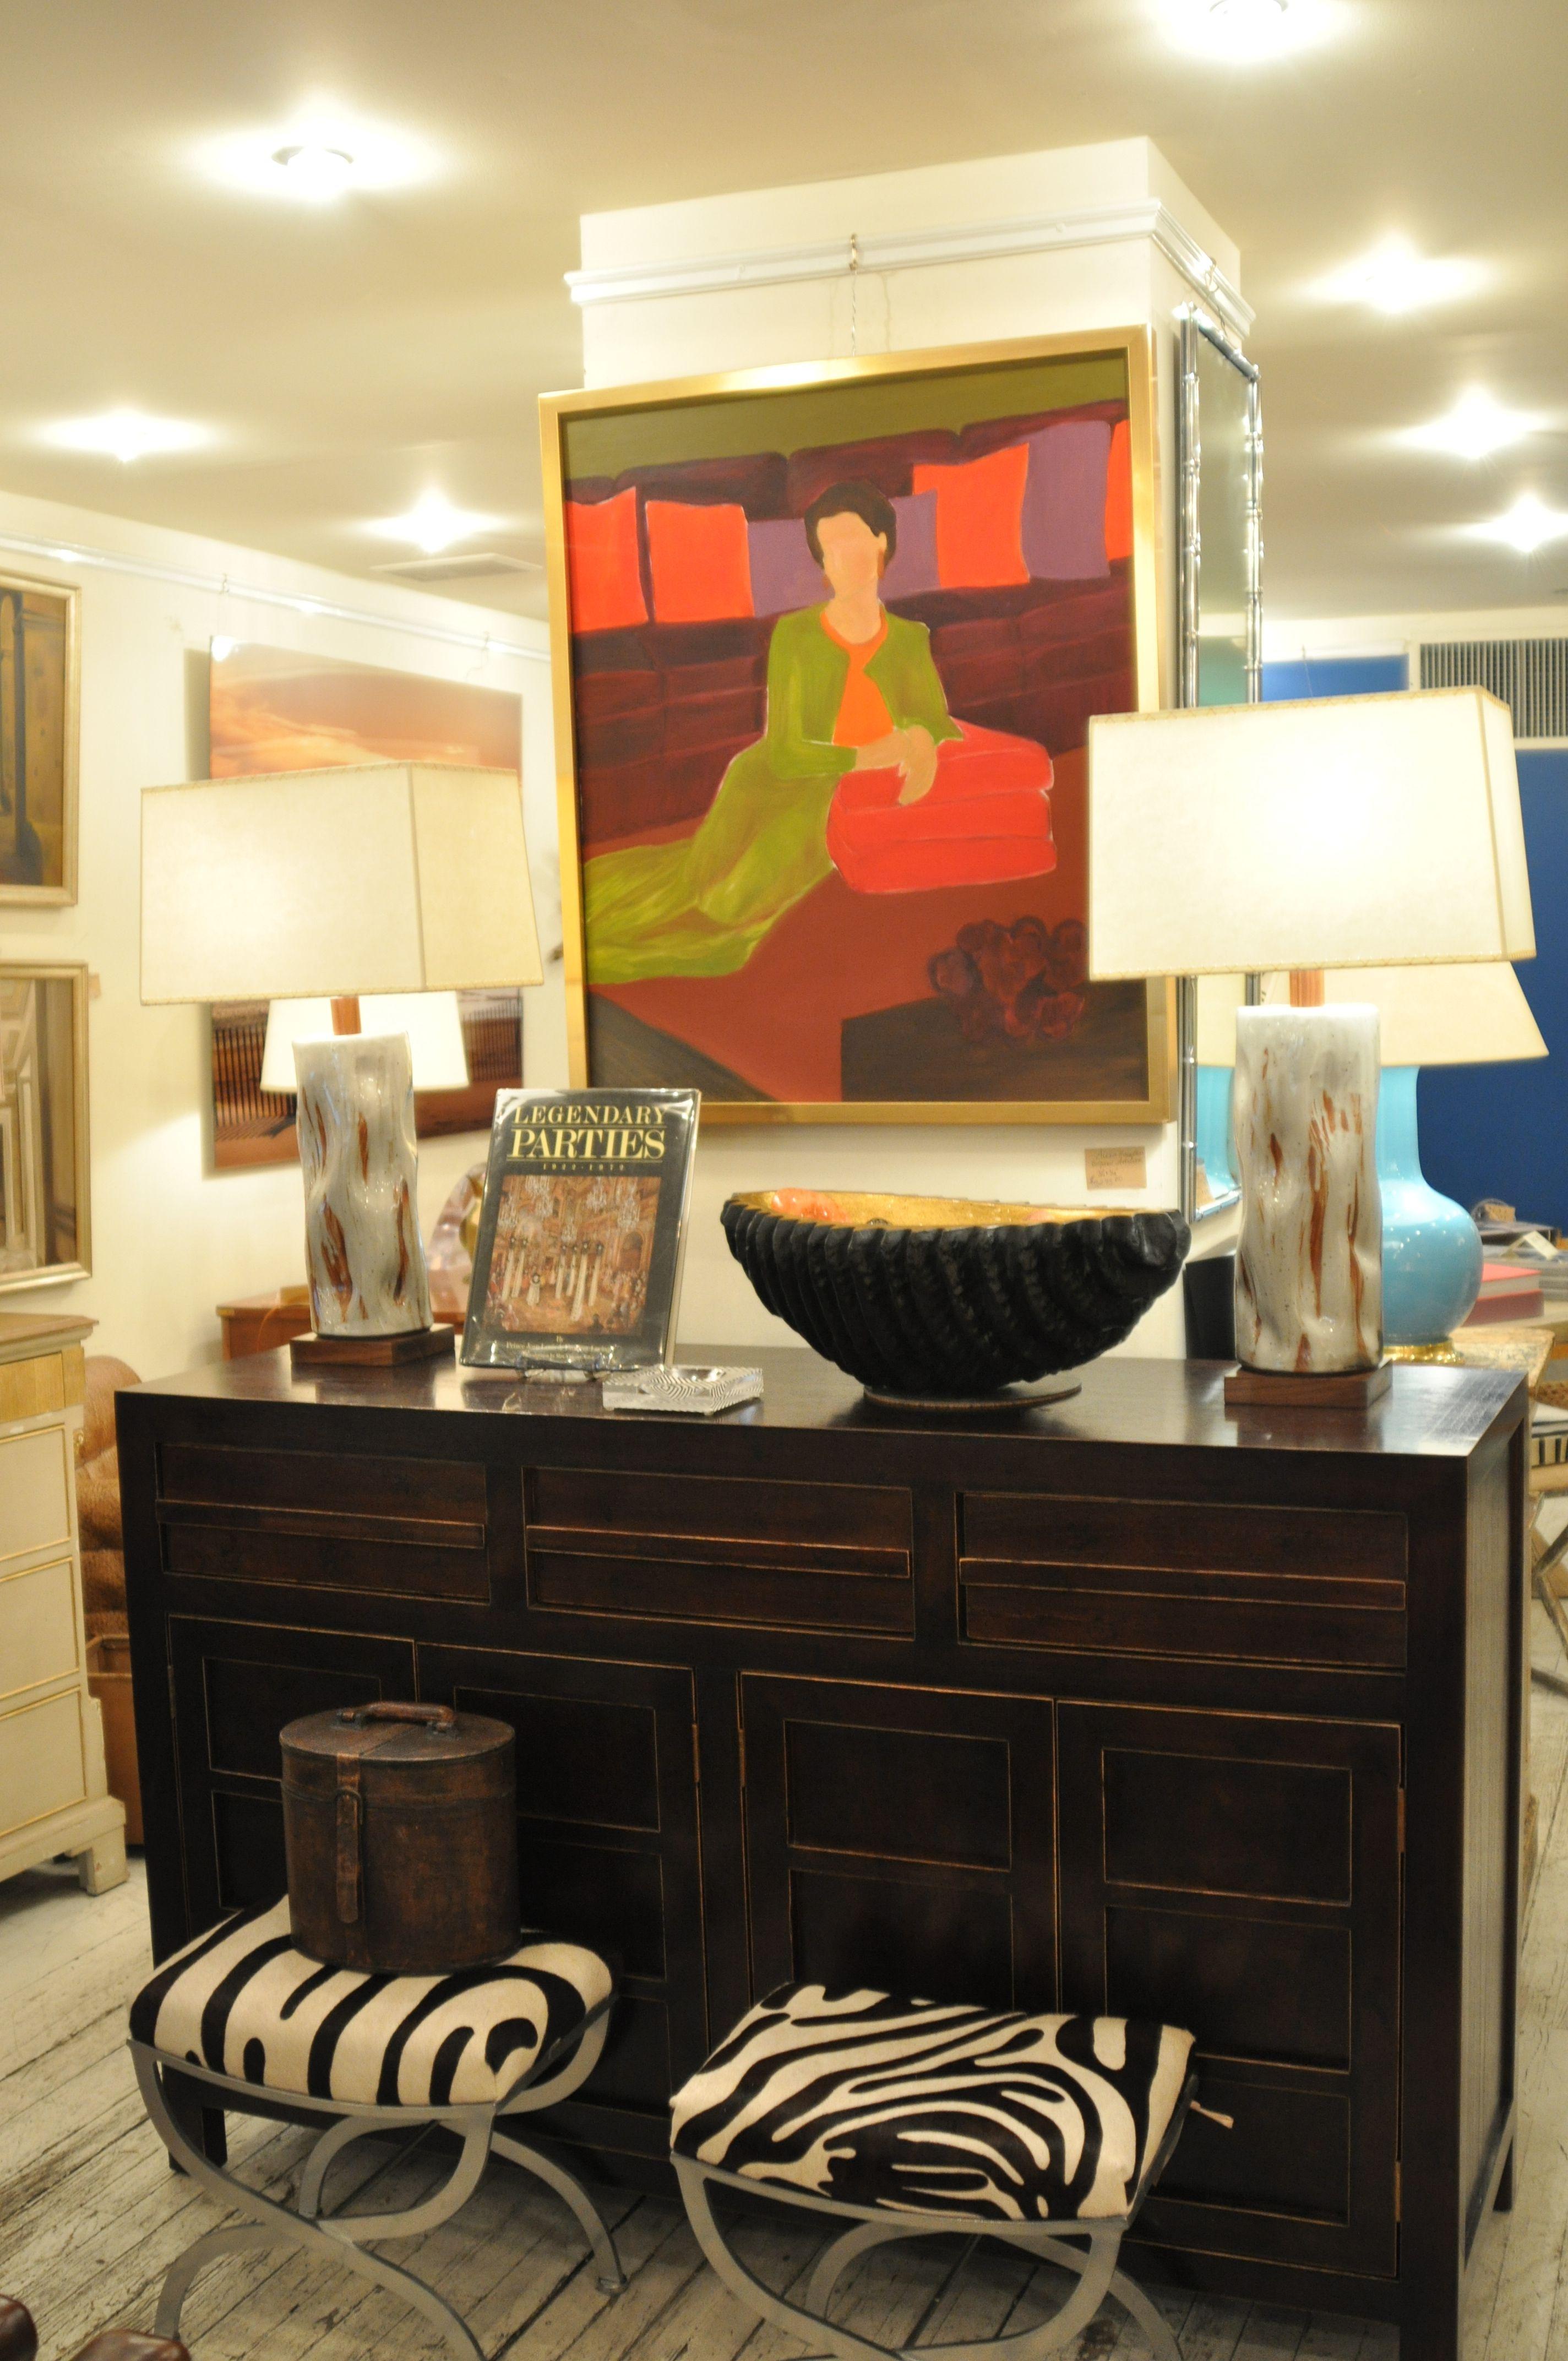 NewYork #Mecox #interiordesign #MecoxGardens #furniture #shopping ...